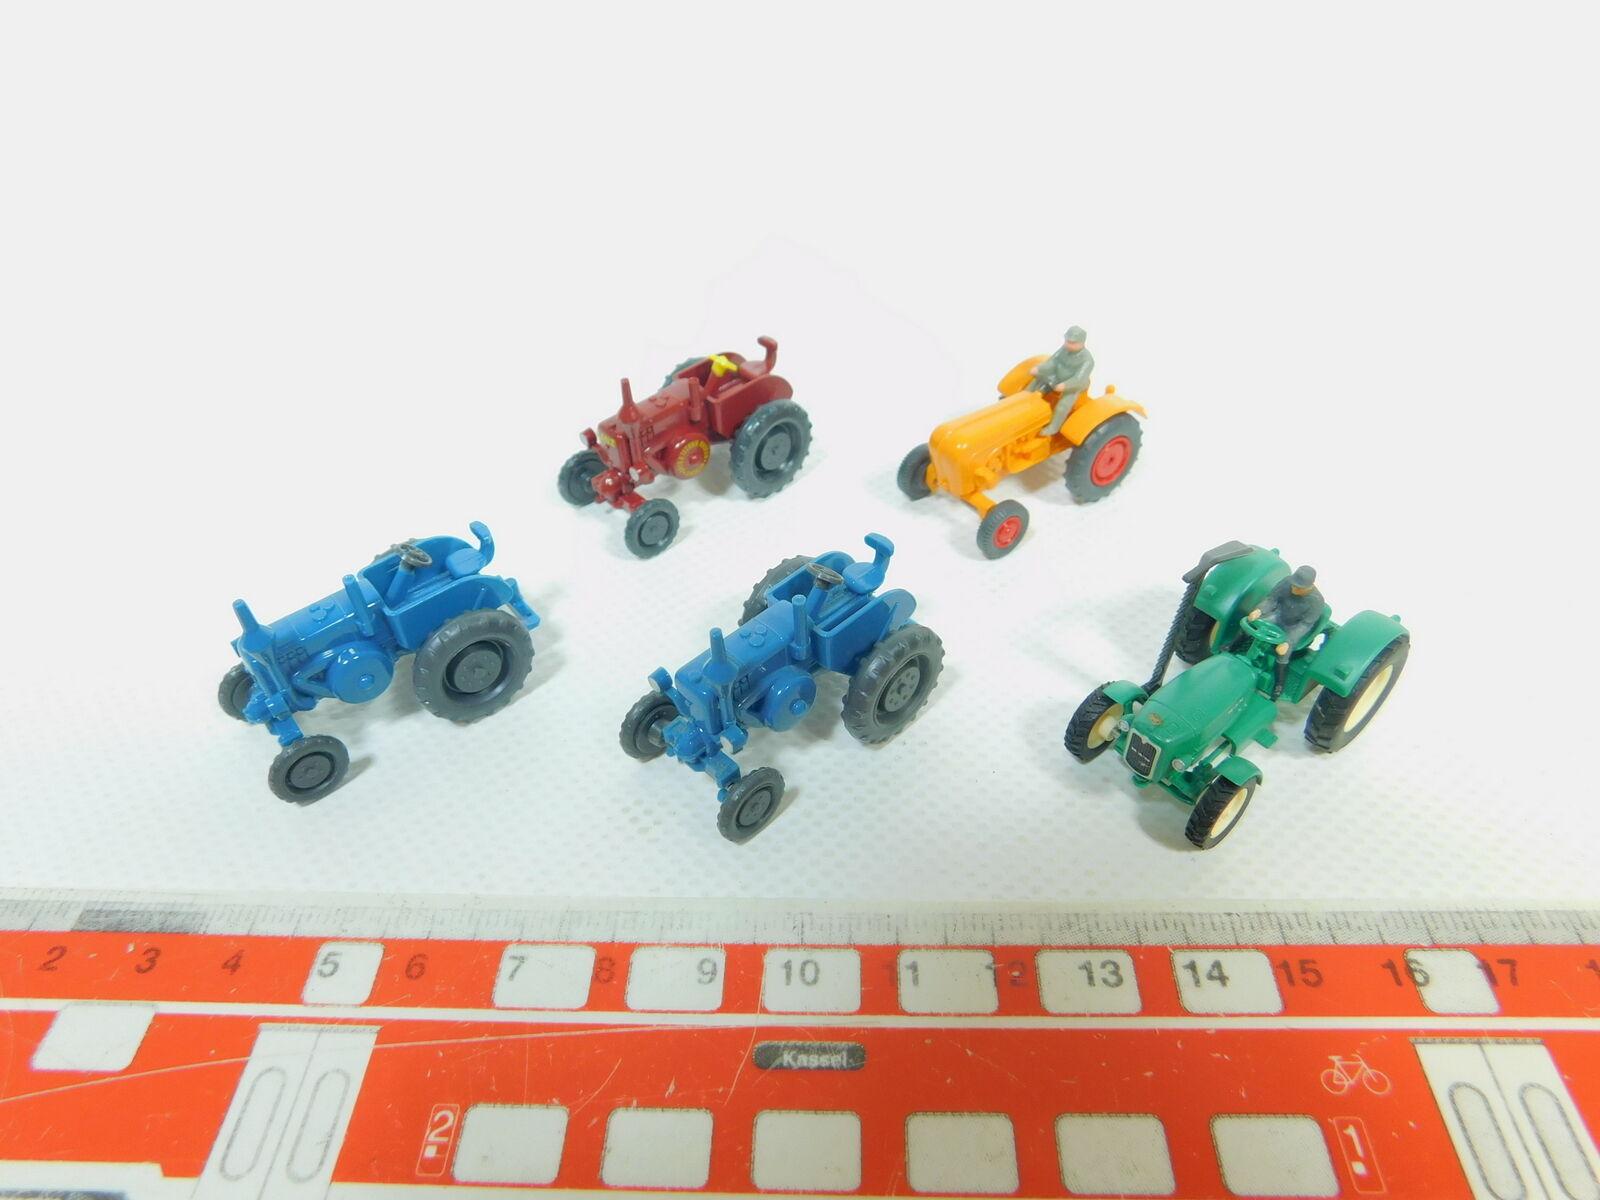 BO492-0, 5 x Wiking H0     1 87 Tractor Bulldog Tractor  Porsche etc. , Mint 3baf1d